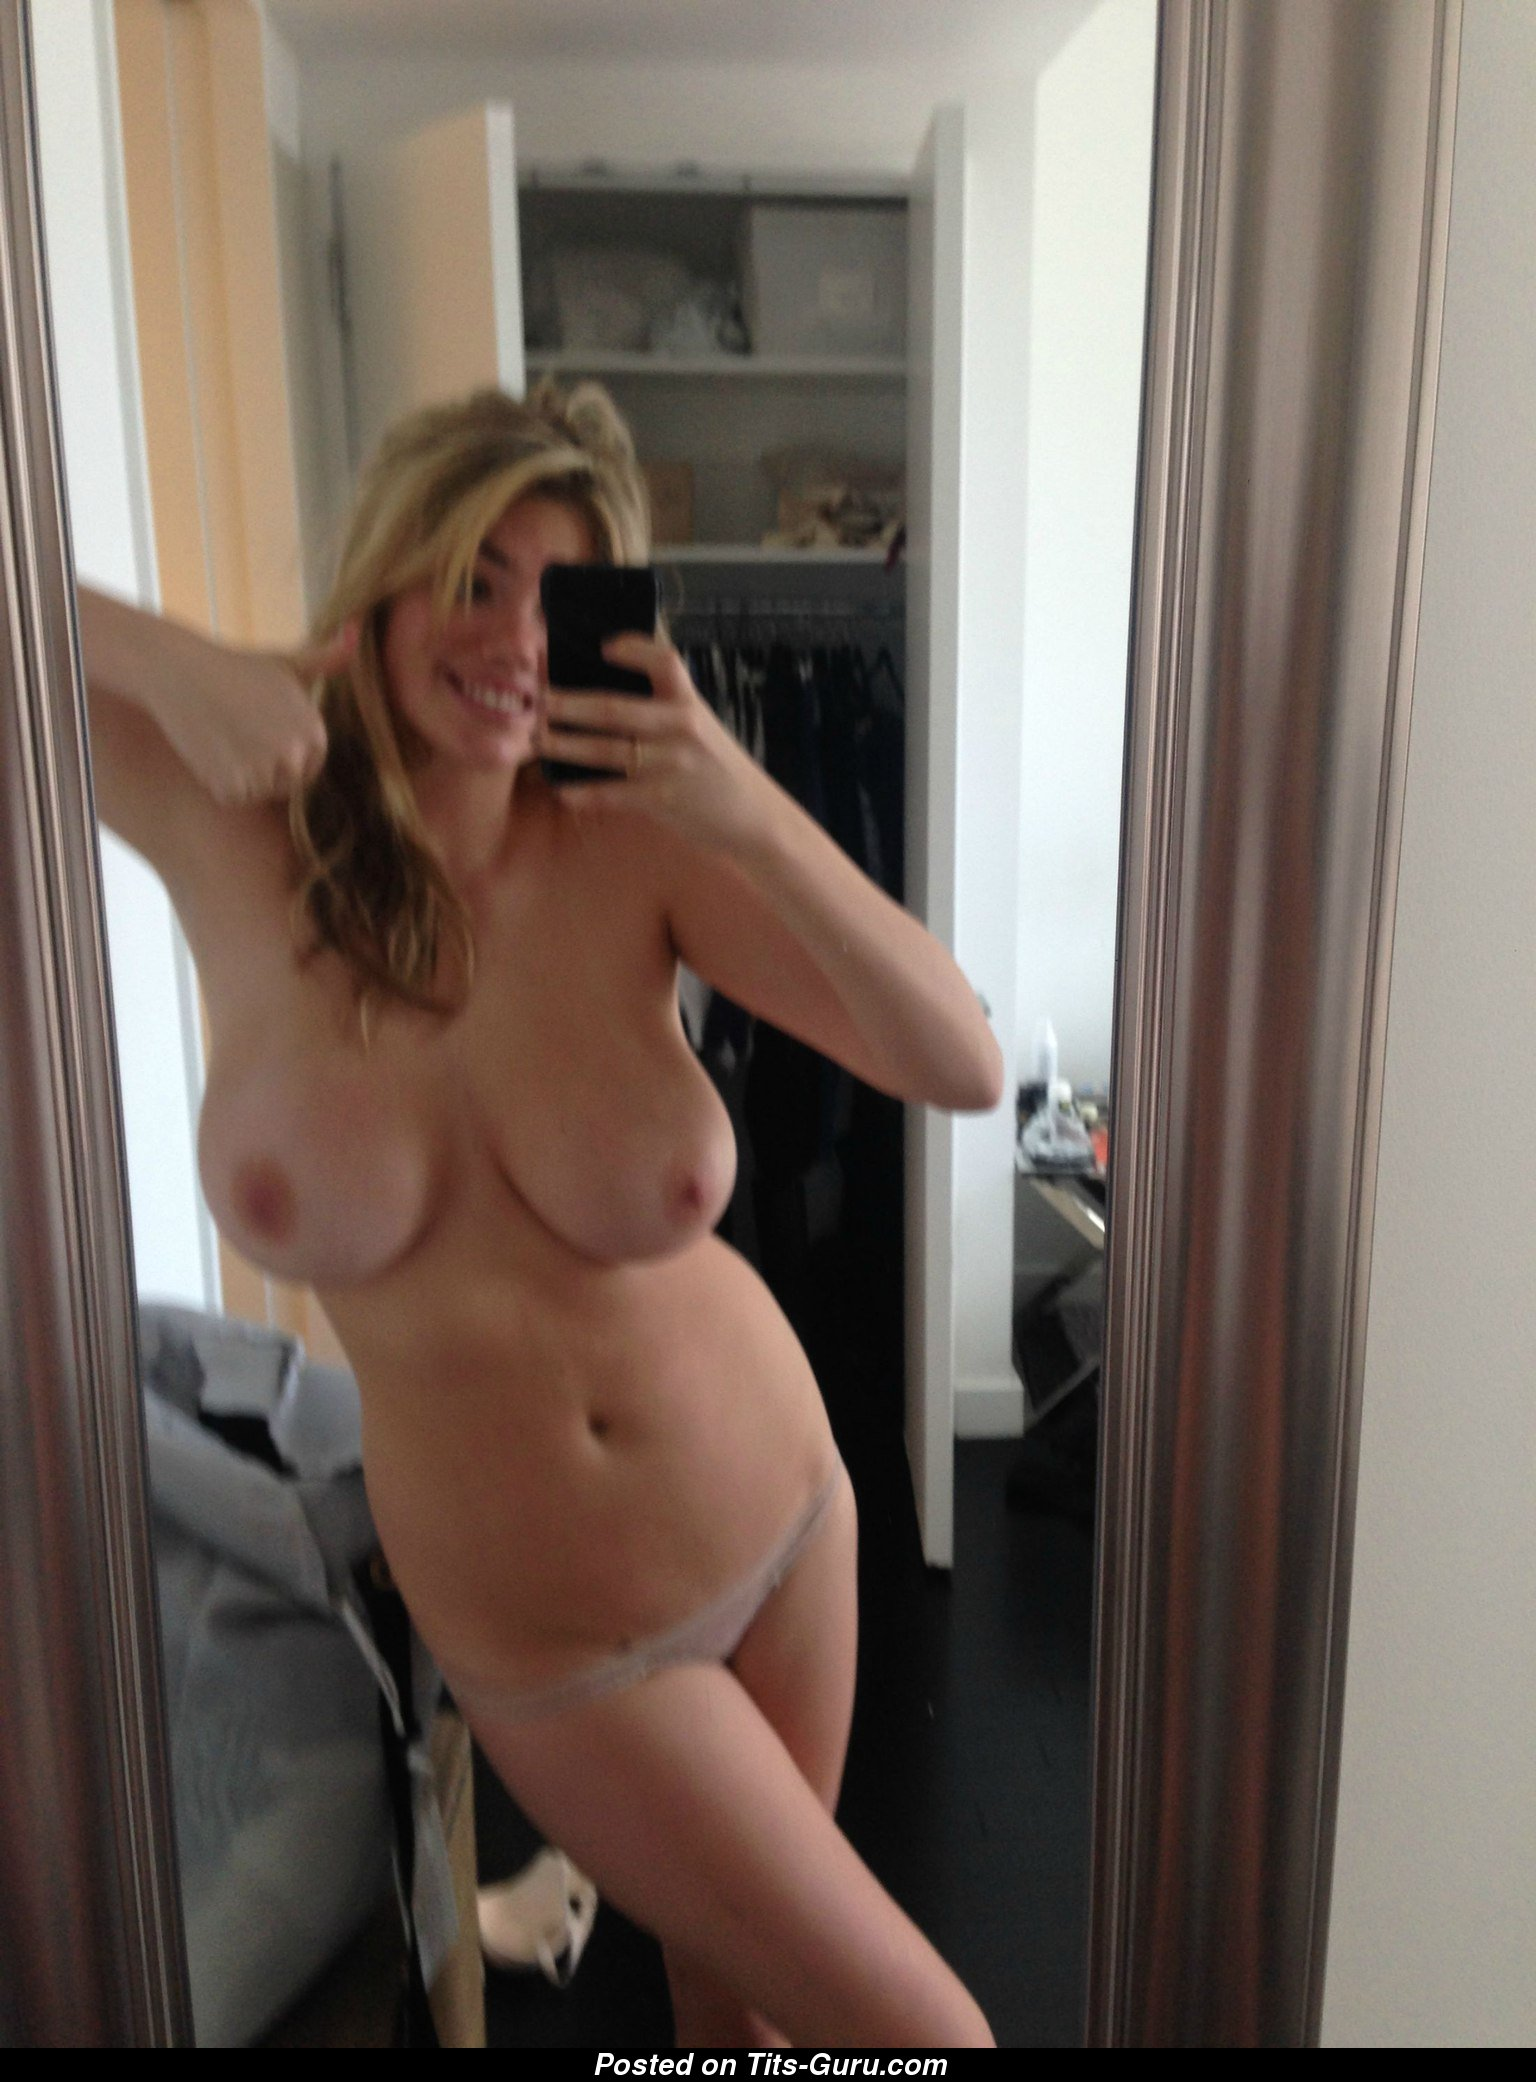 Kate Upton Tits Naked photo 26